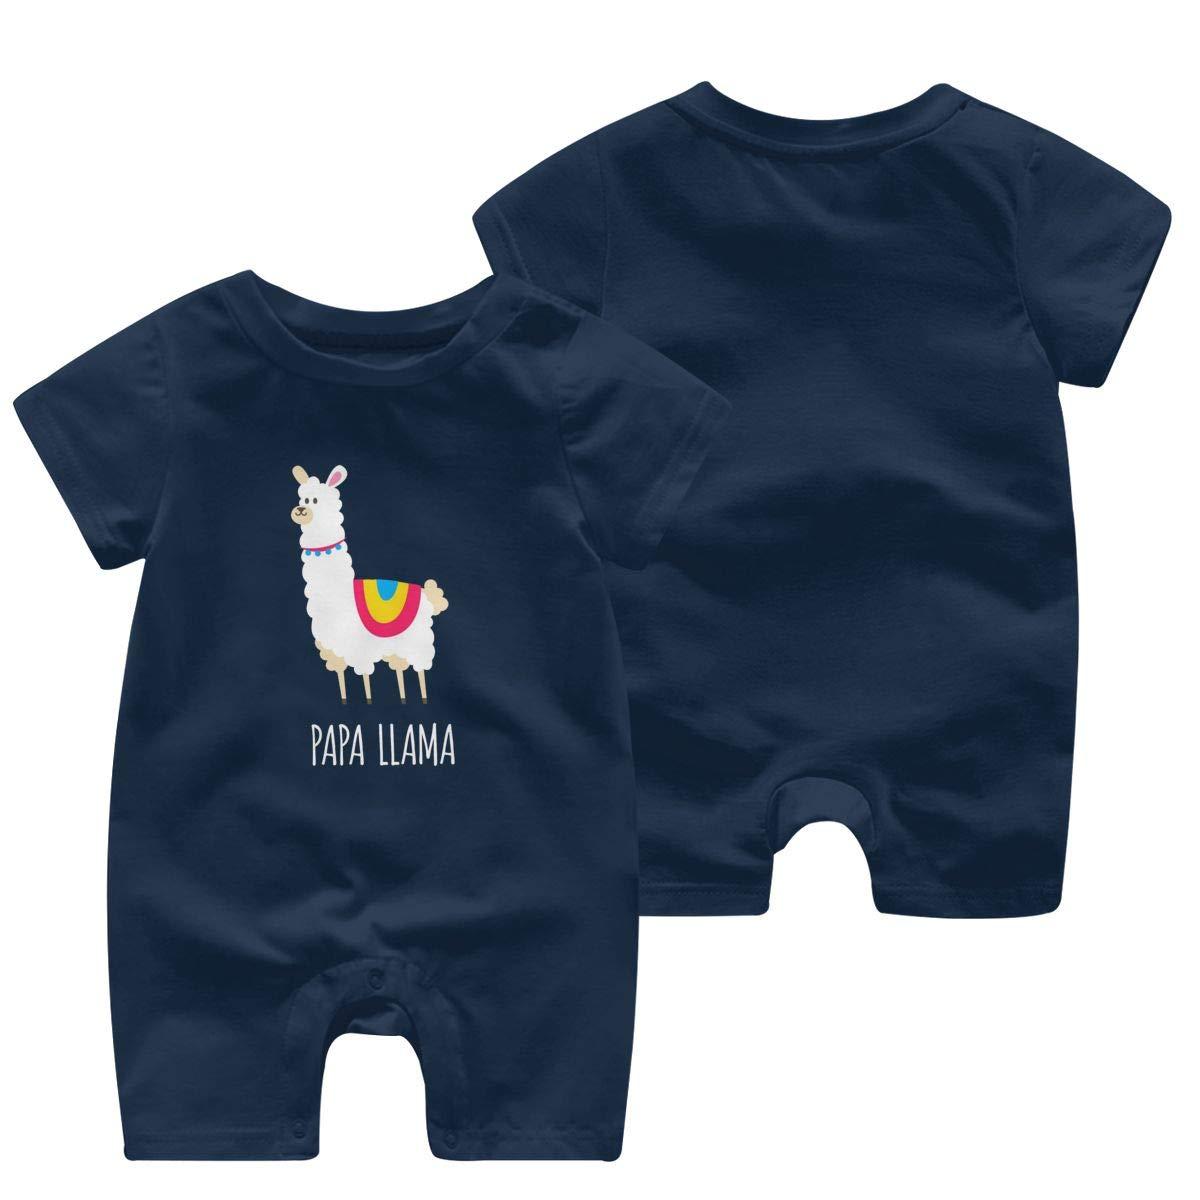 Baby Boys Girls Short Sleeve Jumpsuit PAPA Llama Cotton Romper